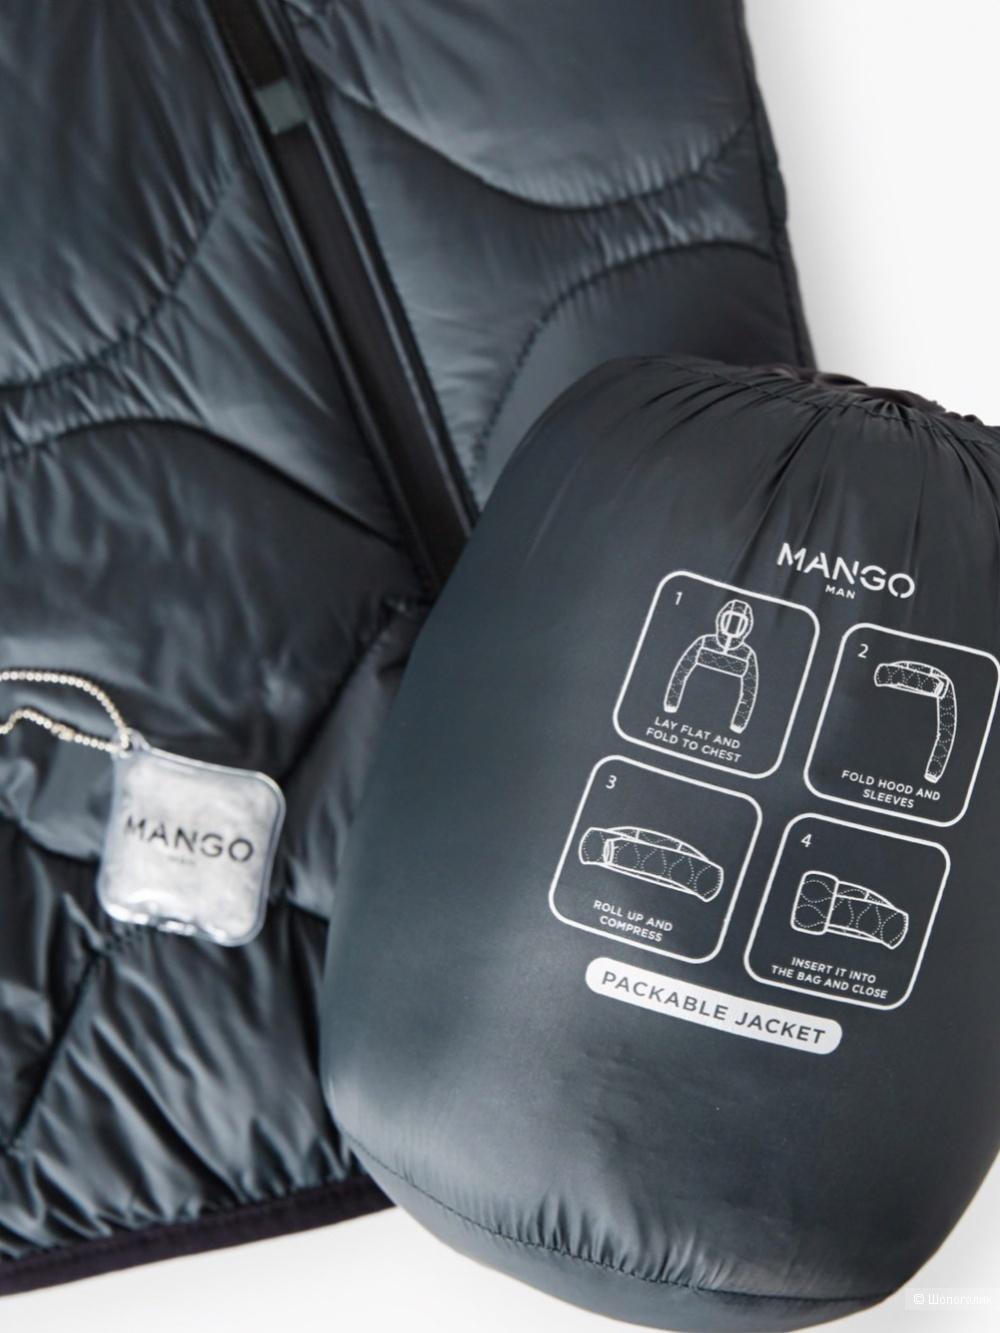 Пуховик Mango, размер XL, на 48-50-52